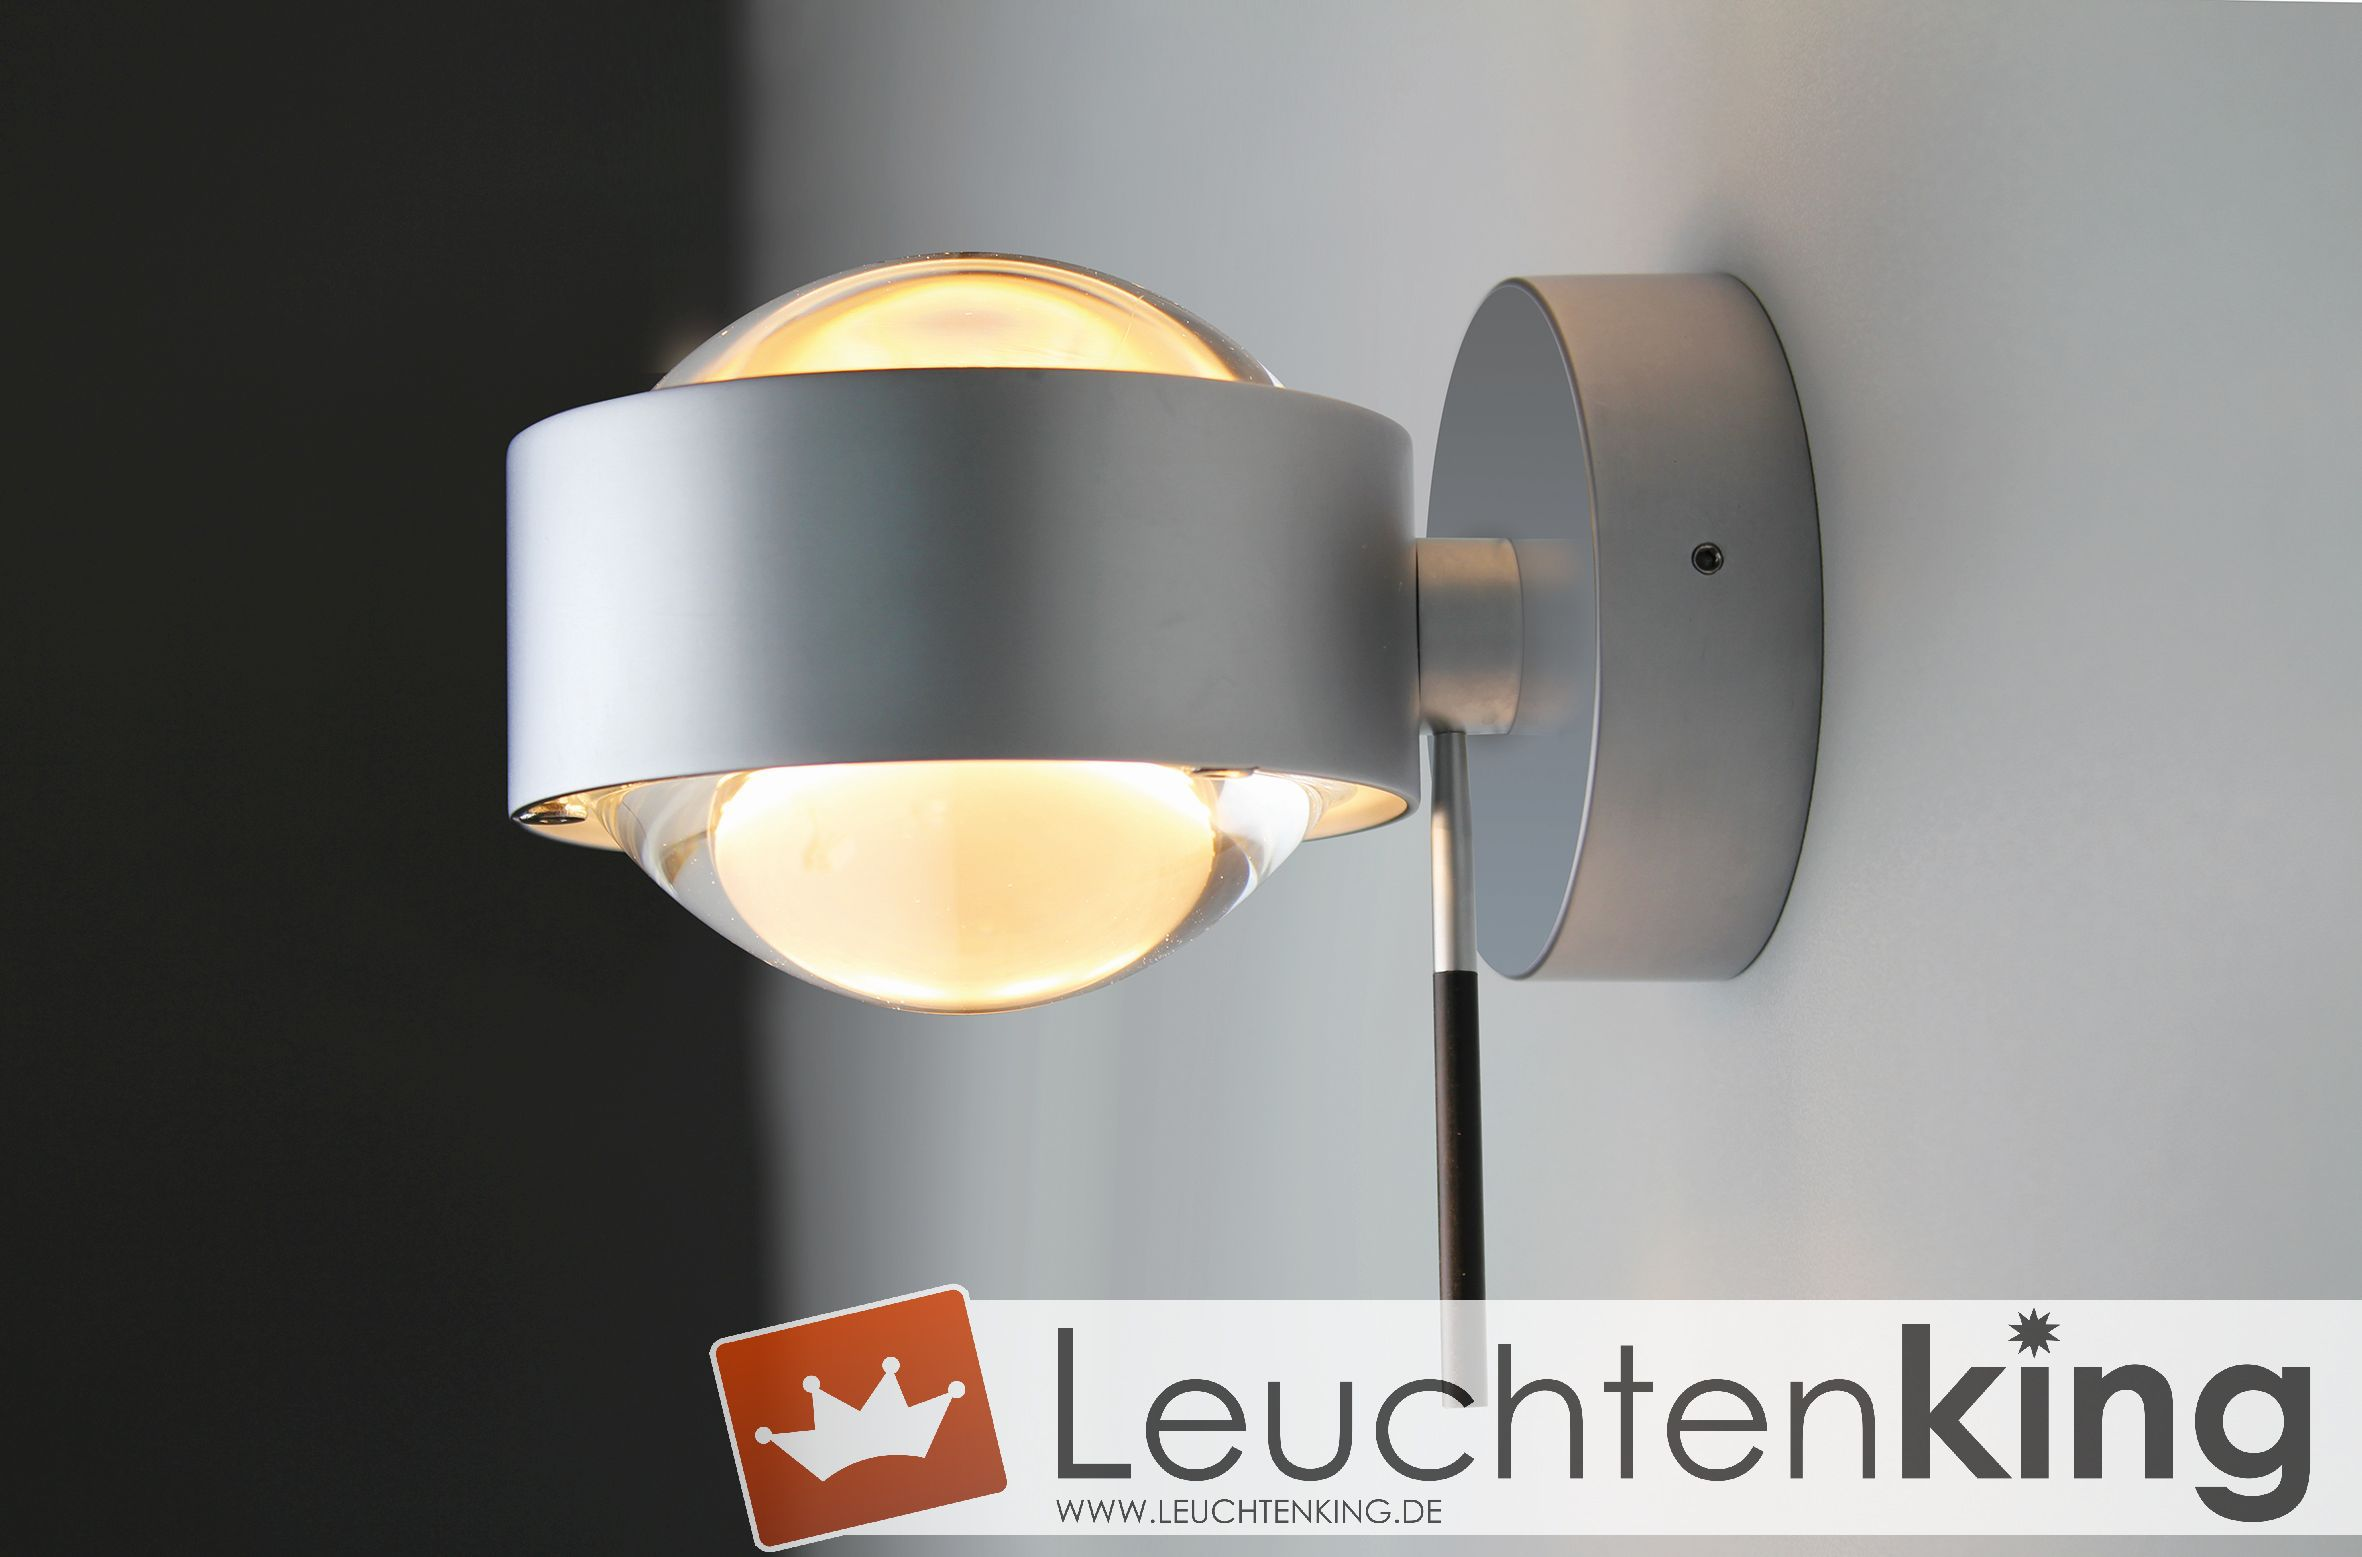 Top light leuchten puk wall plus mit g9 fassung led retrofit 2